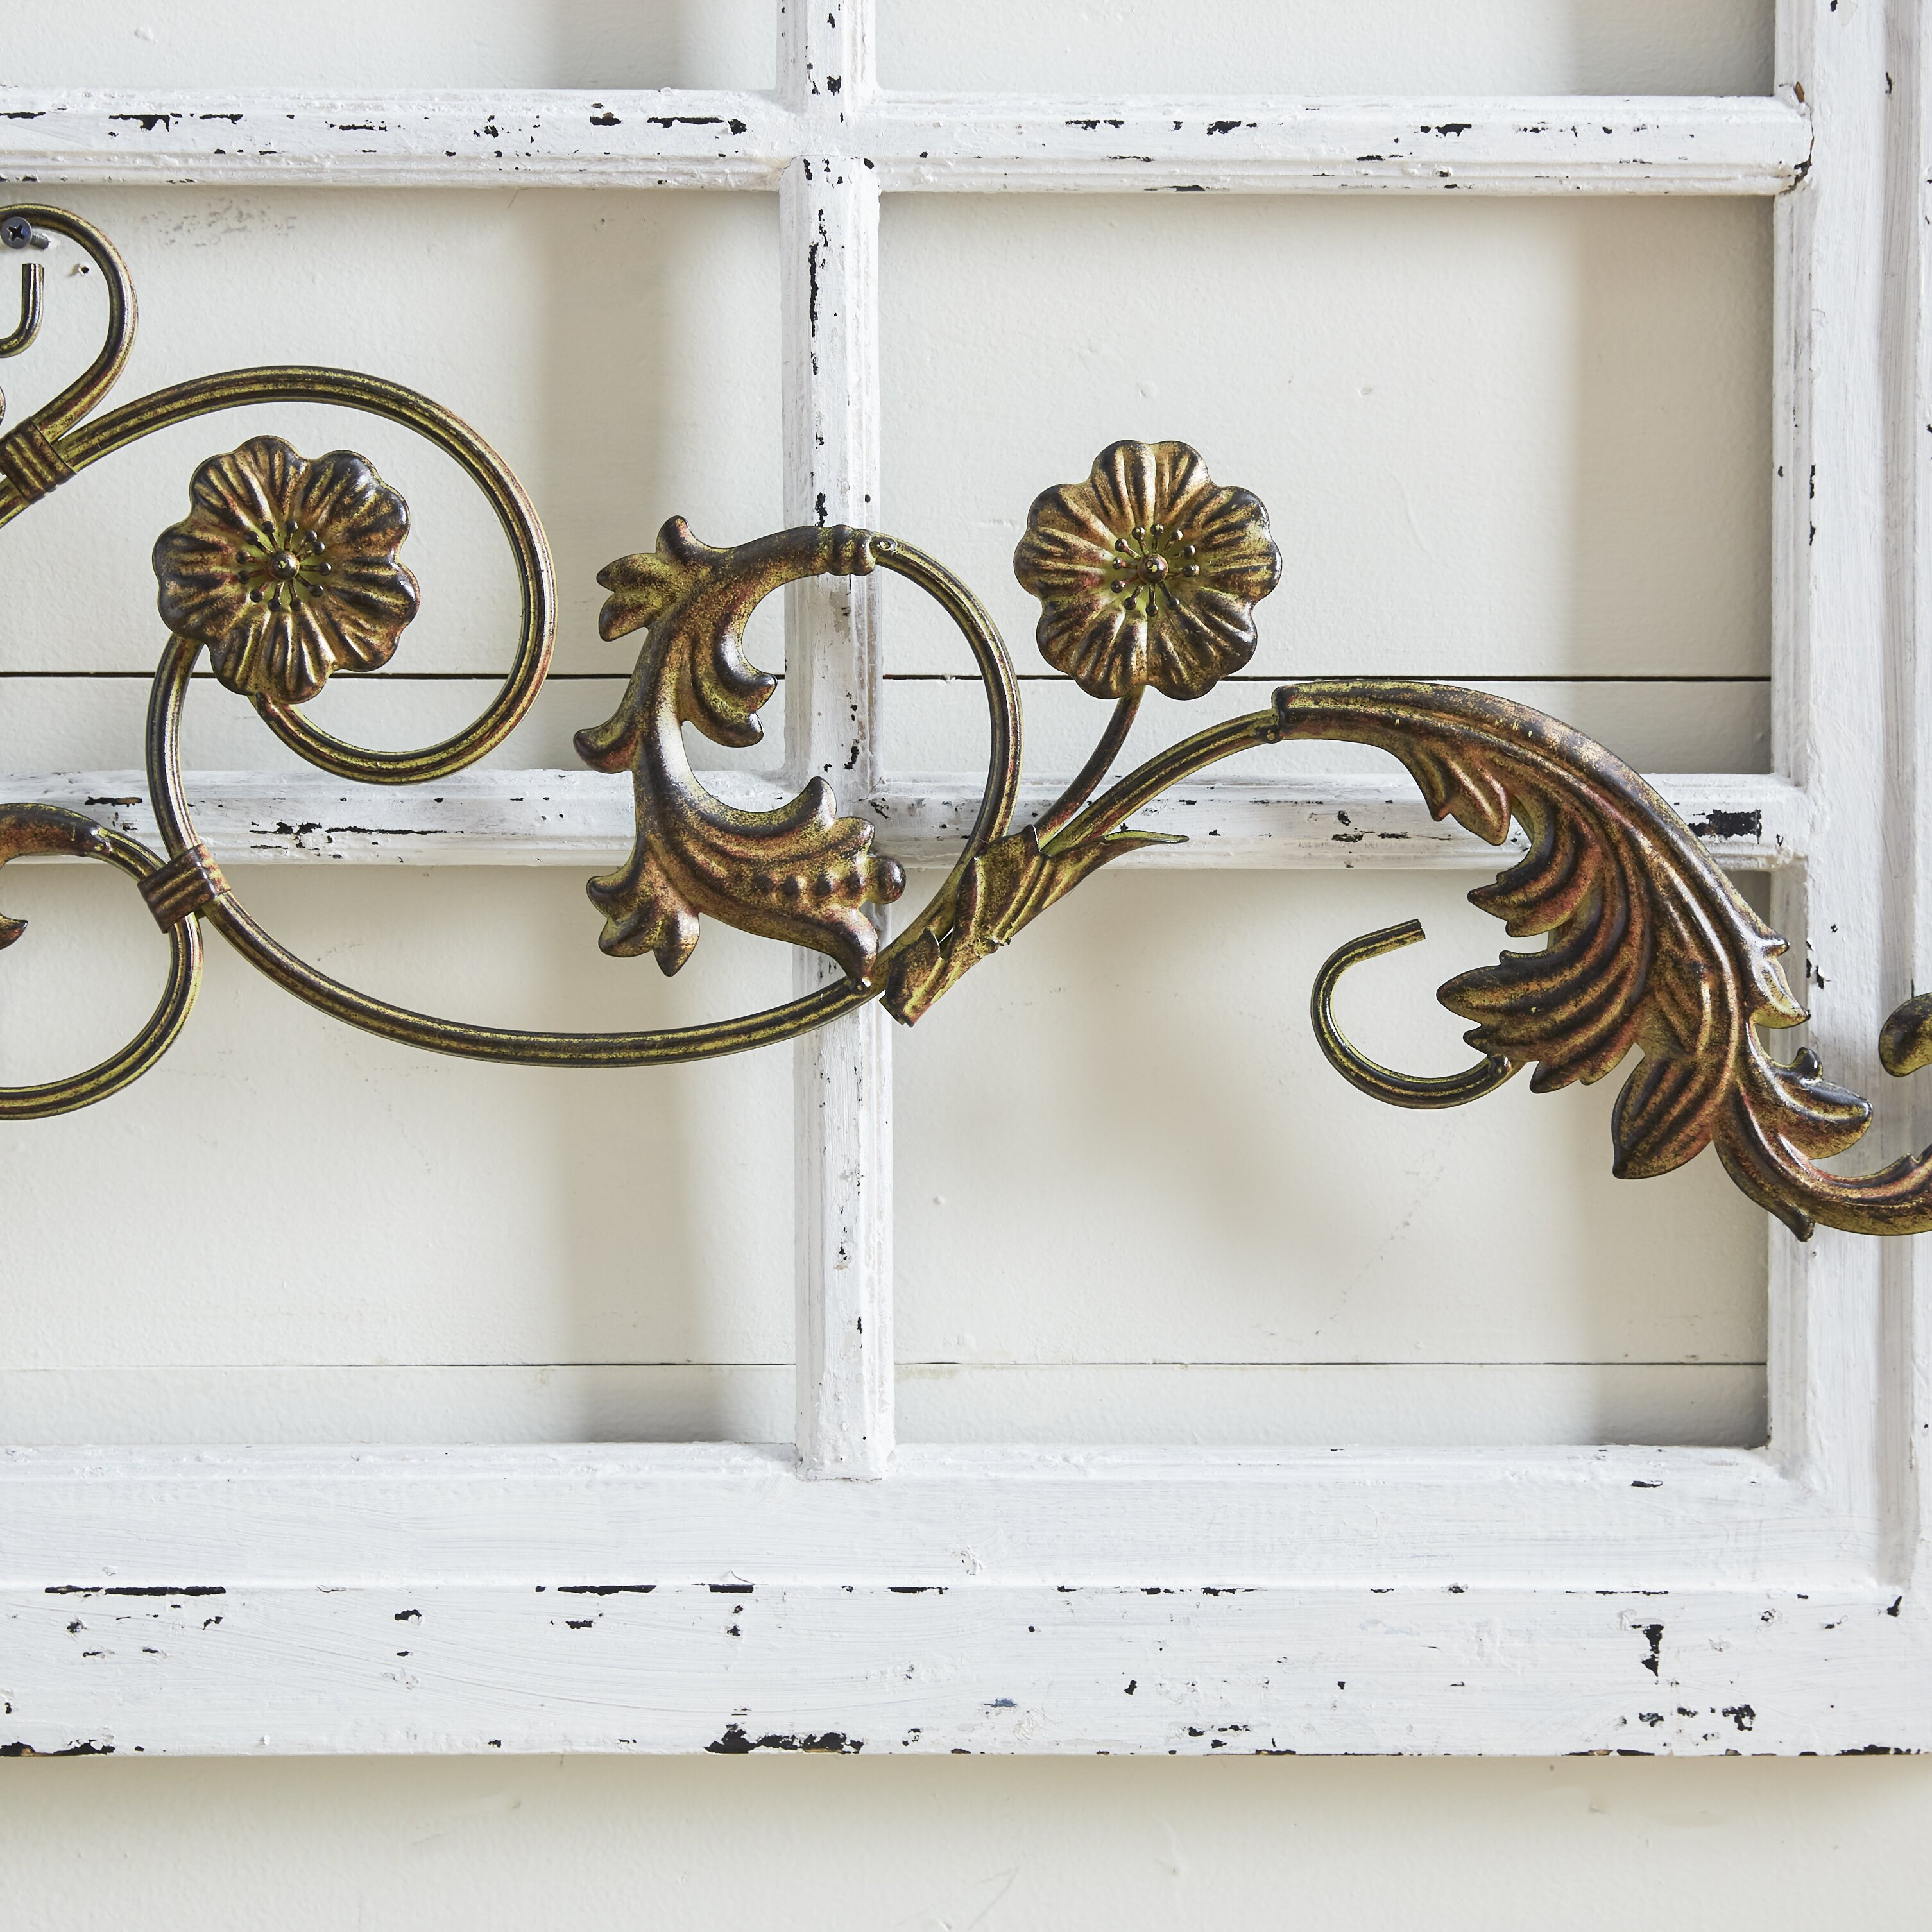 Charlton Home Wrought Iron Wall D?cor & Reviews | Wayfair